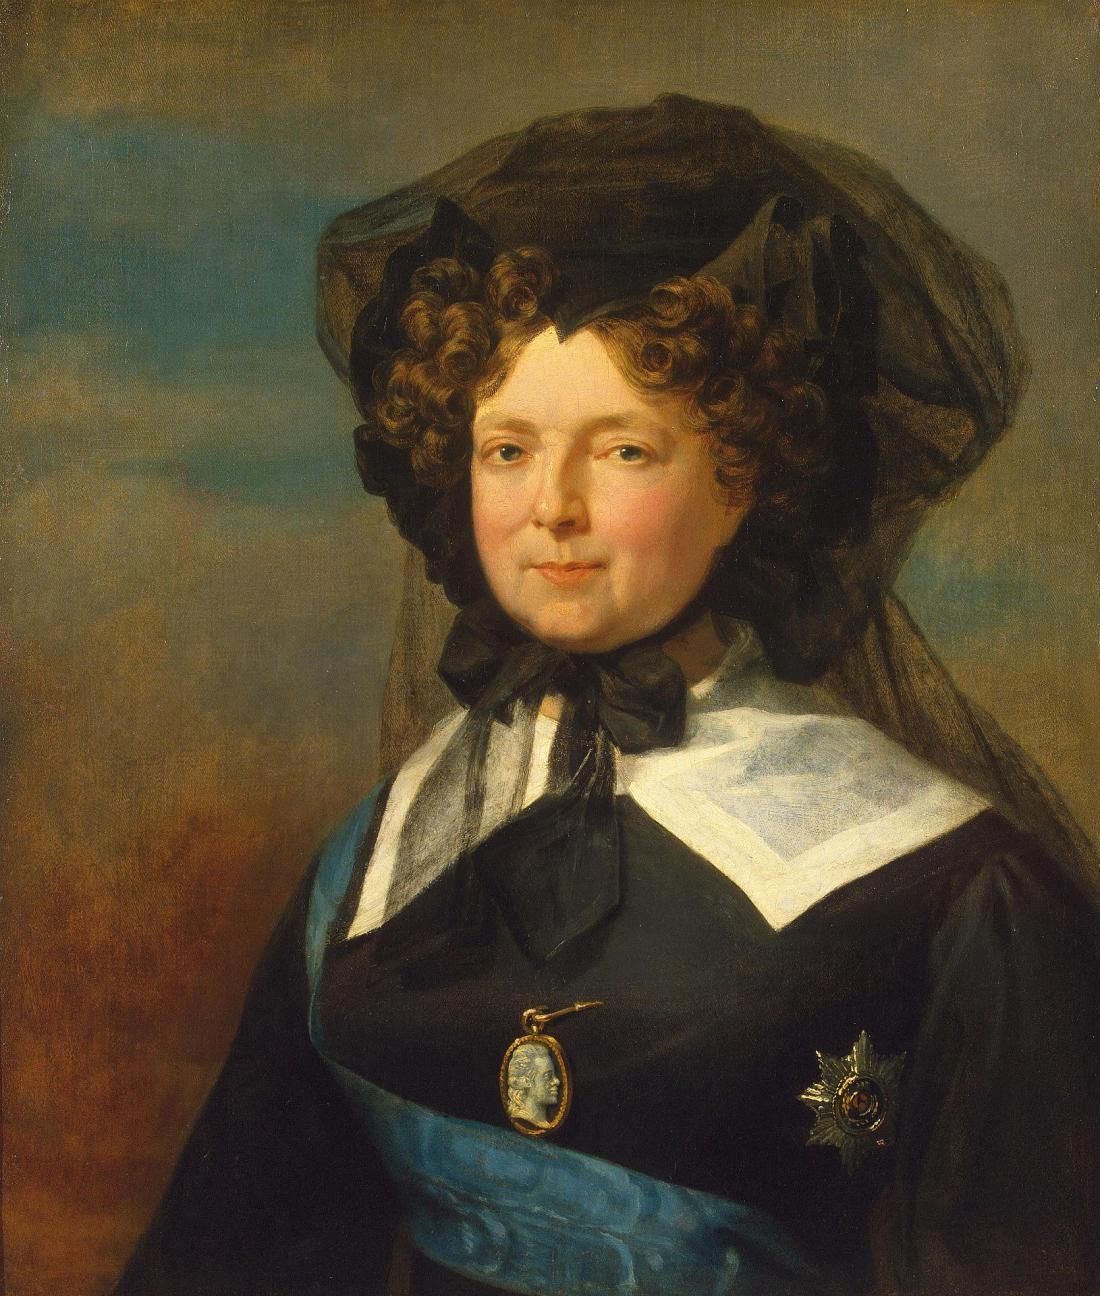 Tsaritsa Marie Feodorovna, widow of Paul I. 1825.